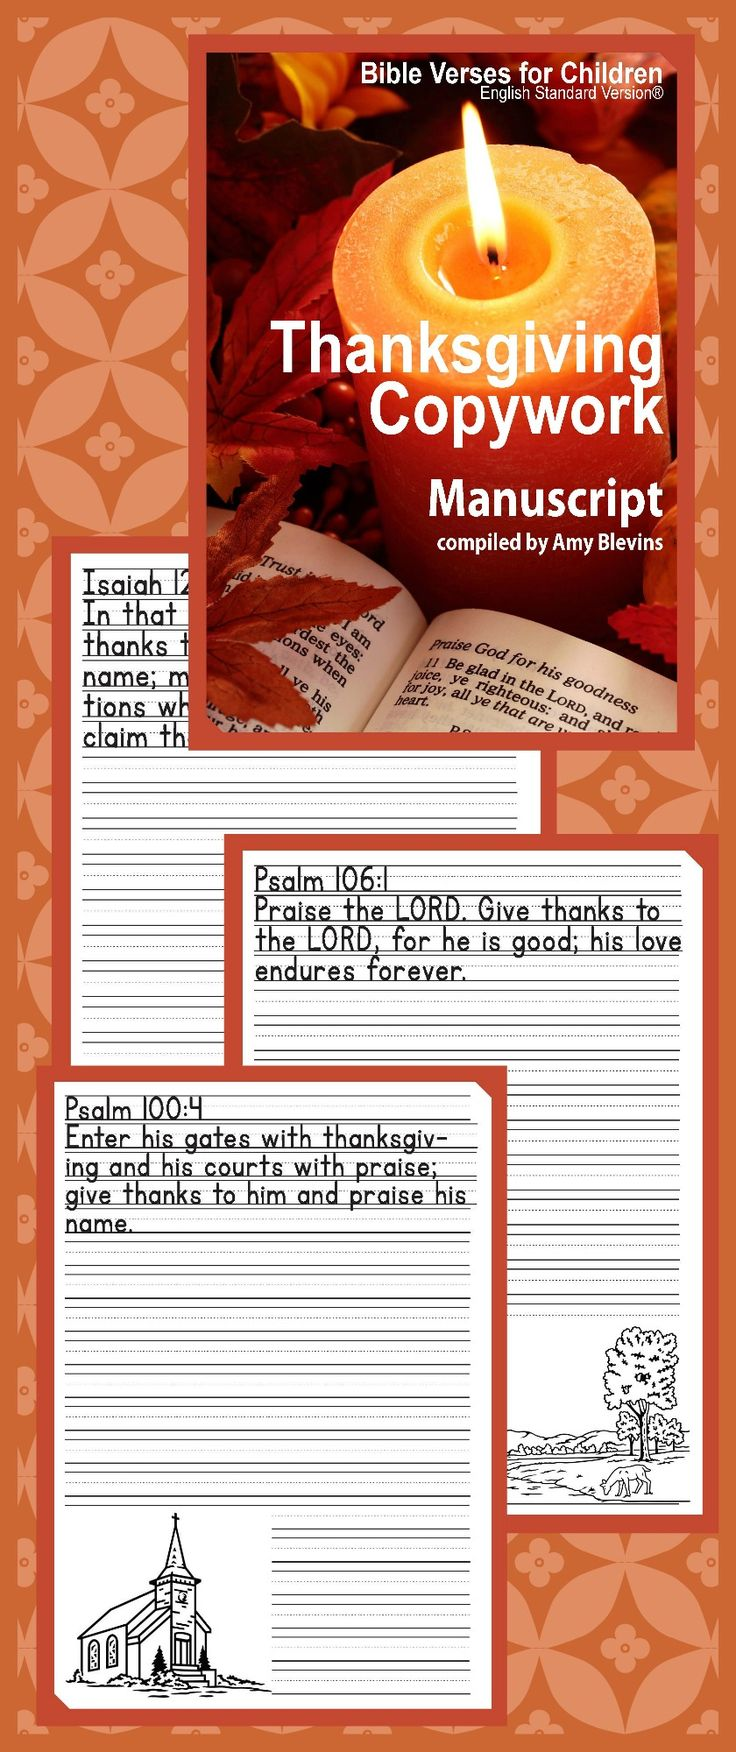 465 best children u0027s ministry images on pinterest bible crafts